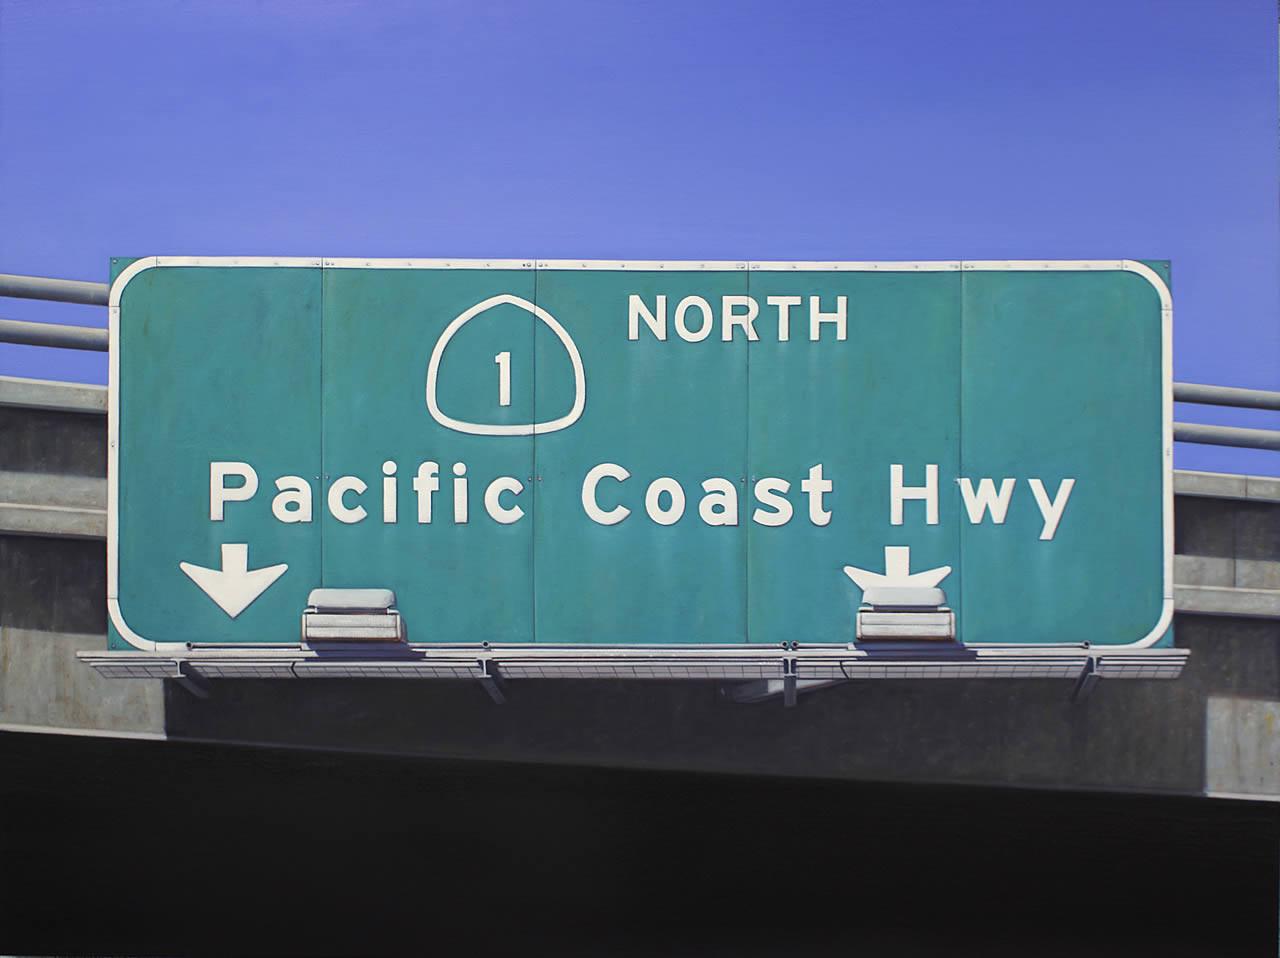 PCH, 1 North